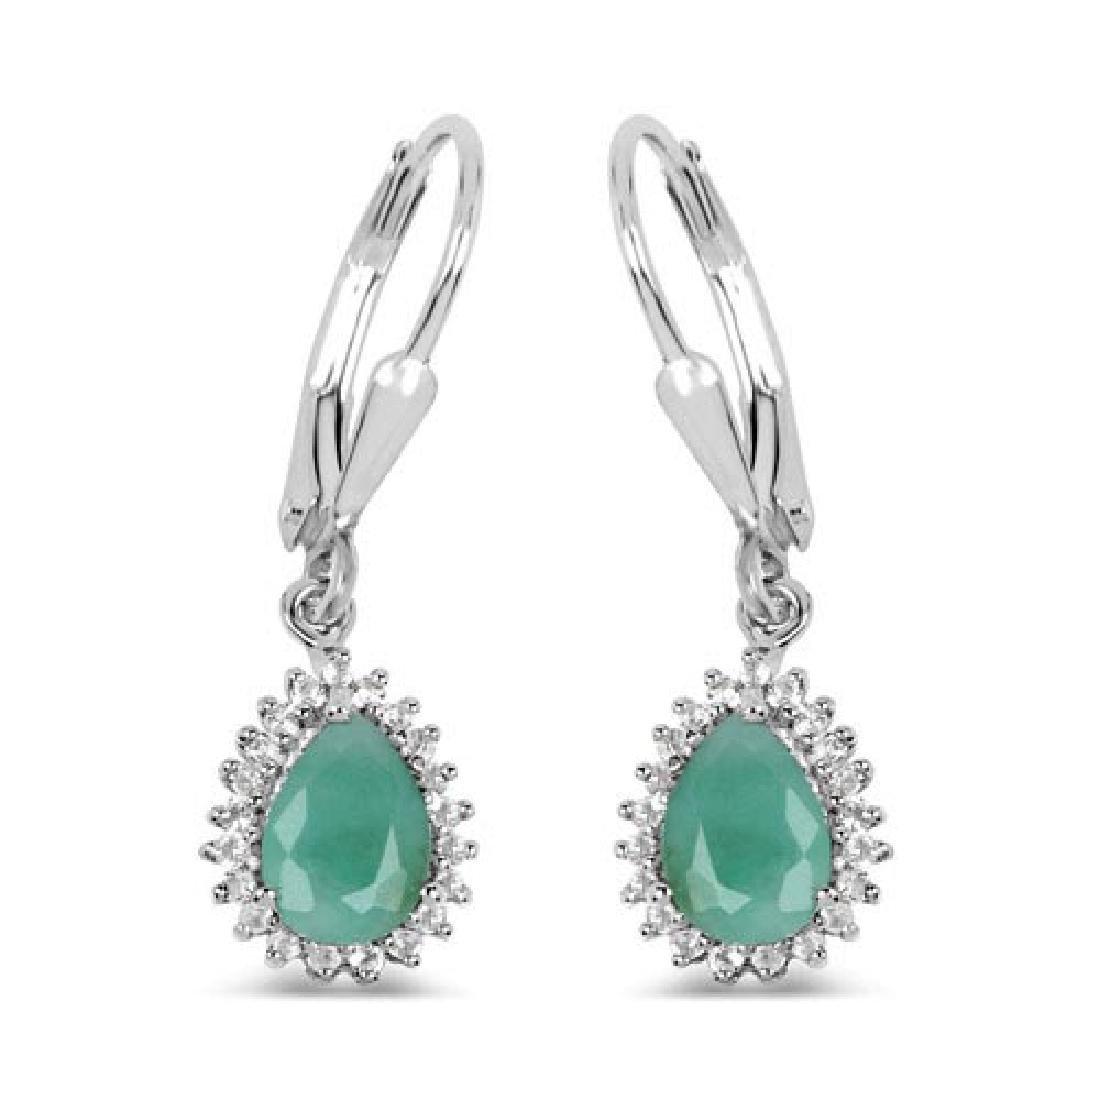 1.45 Carat Genuine Emerald and White Topaz .925 Sterlin